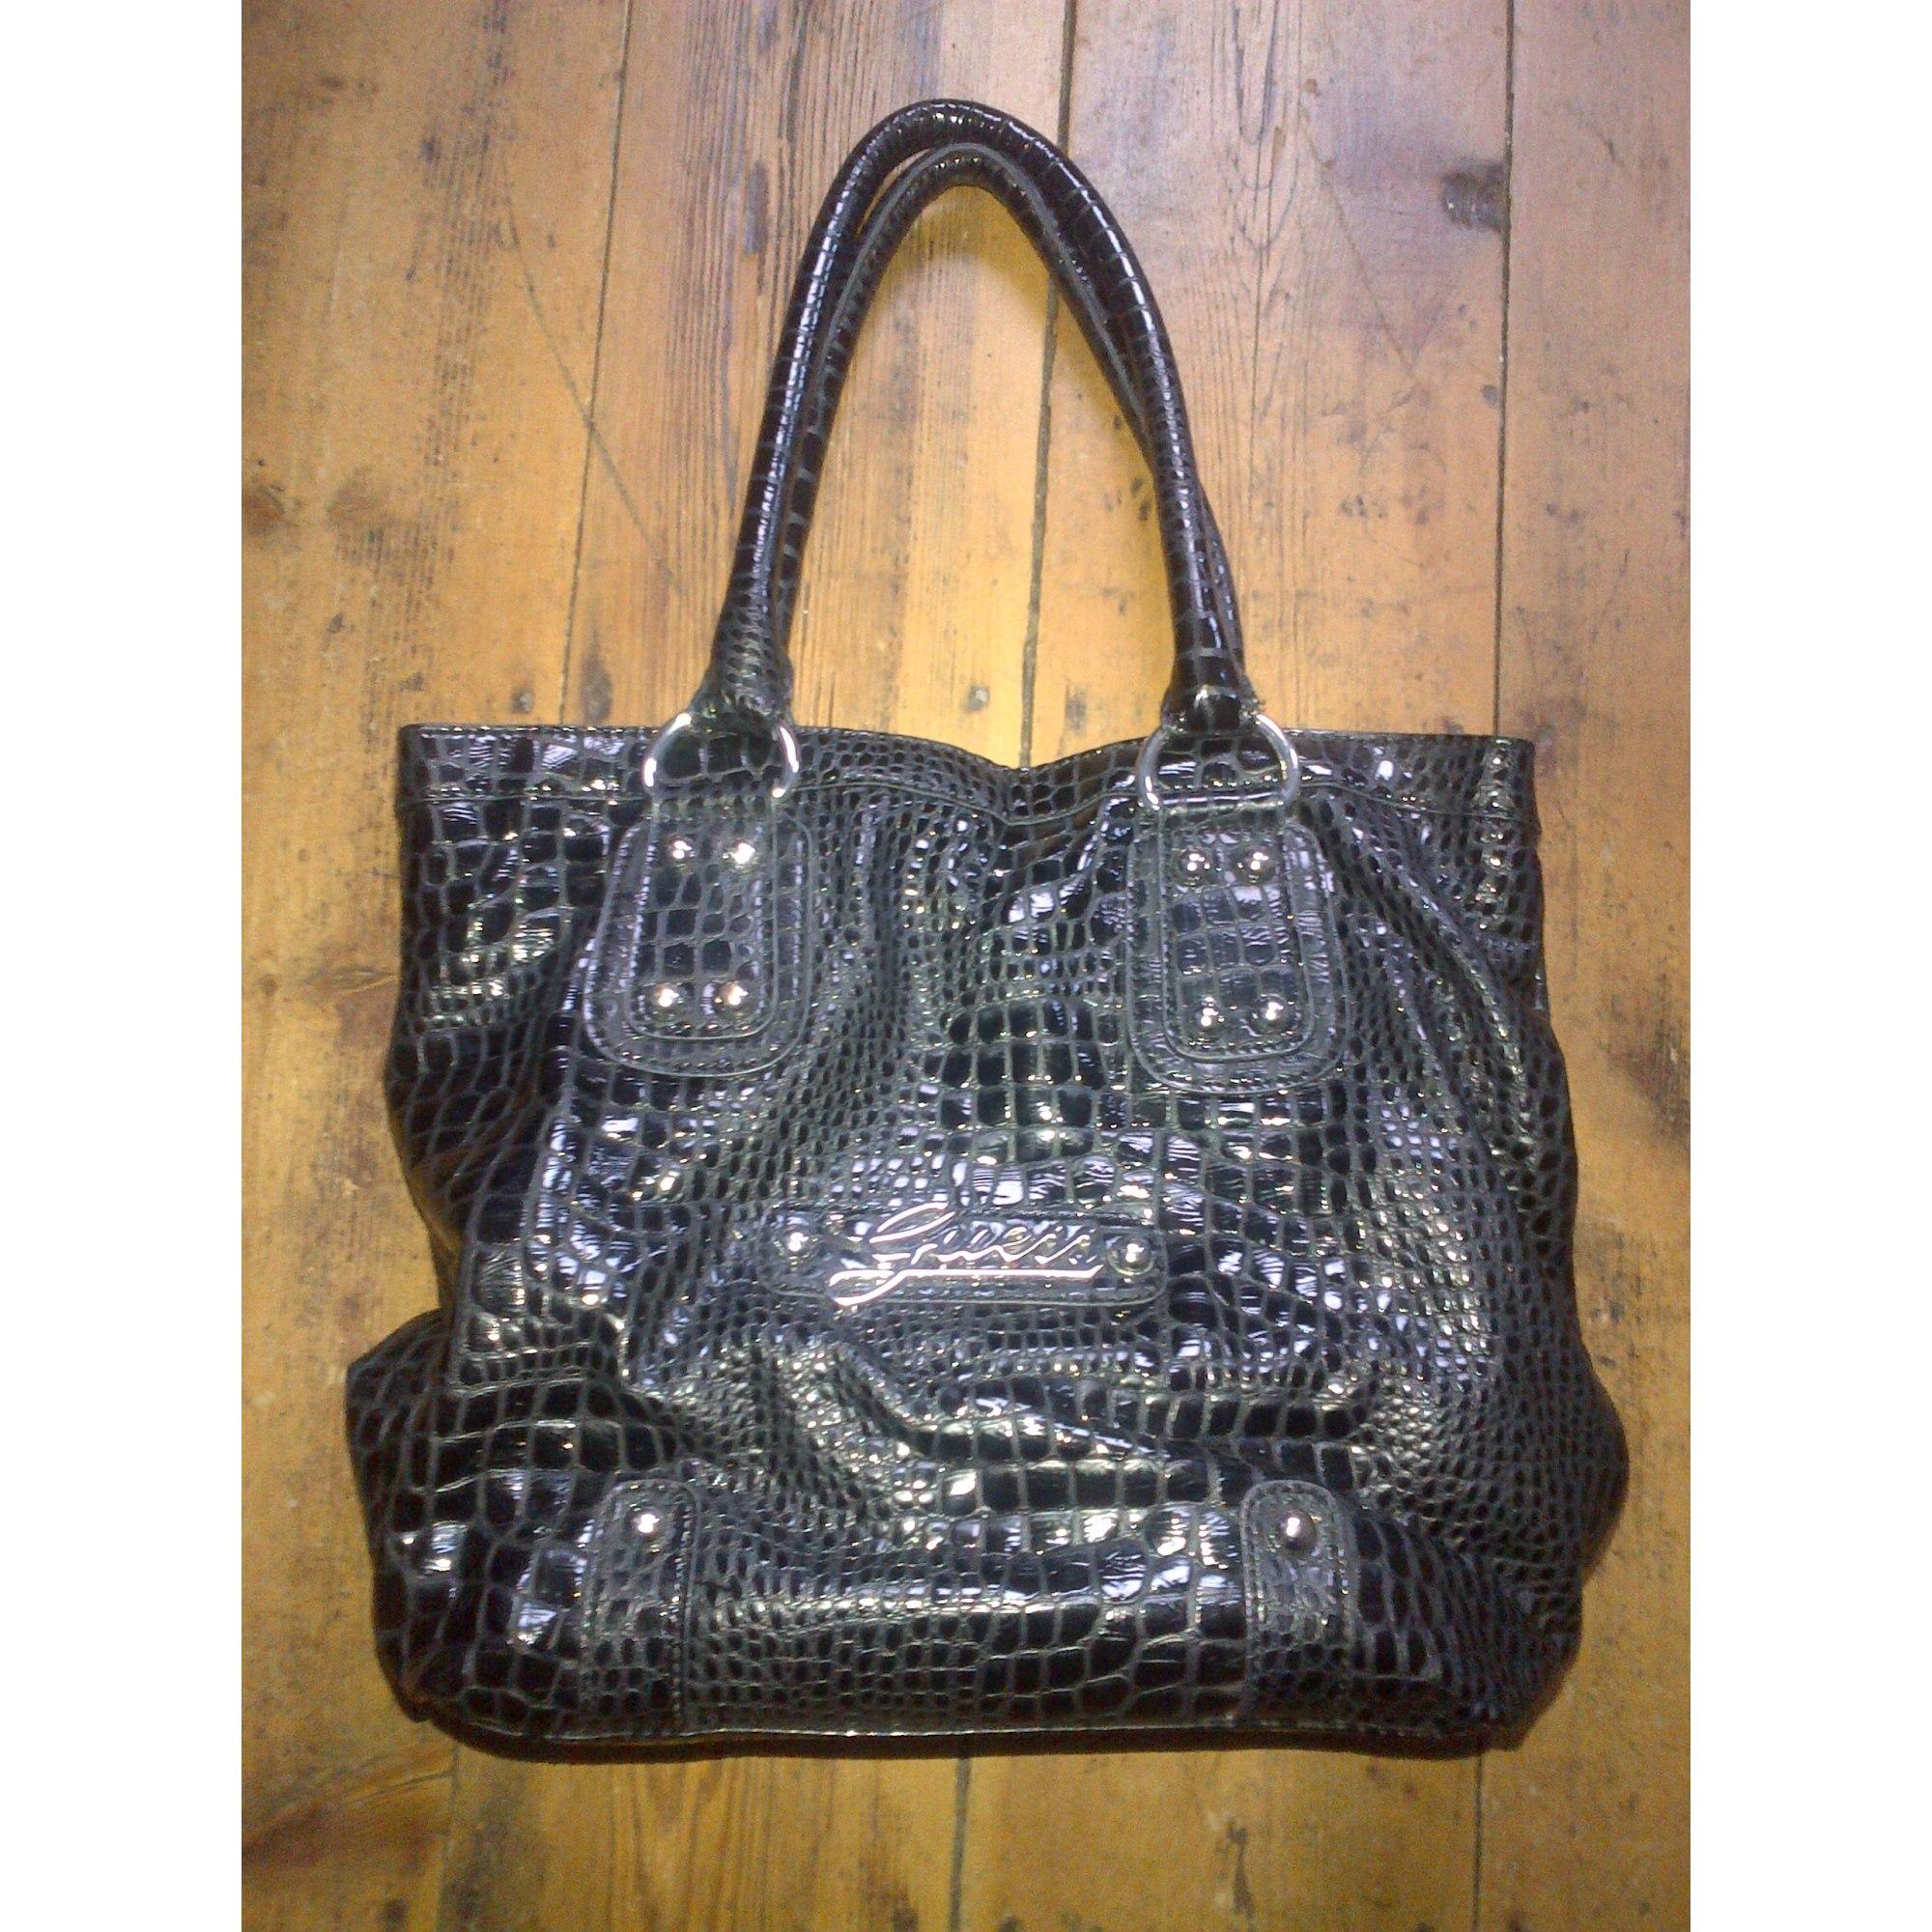 adc6b9f08bed Sac à main en cuir GUESS noir vendu par Lilyma423075 - 1800952